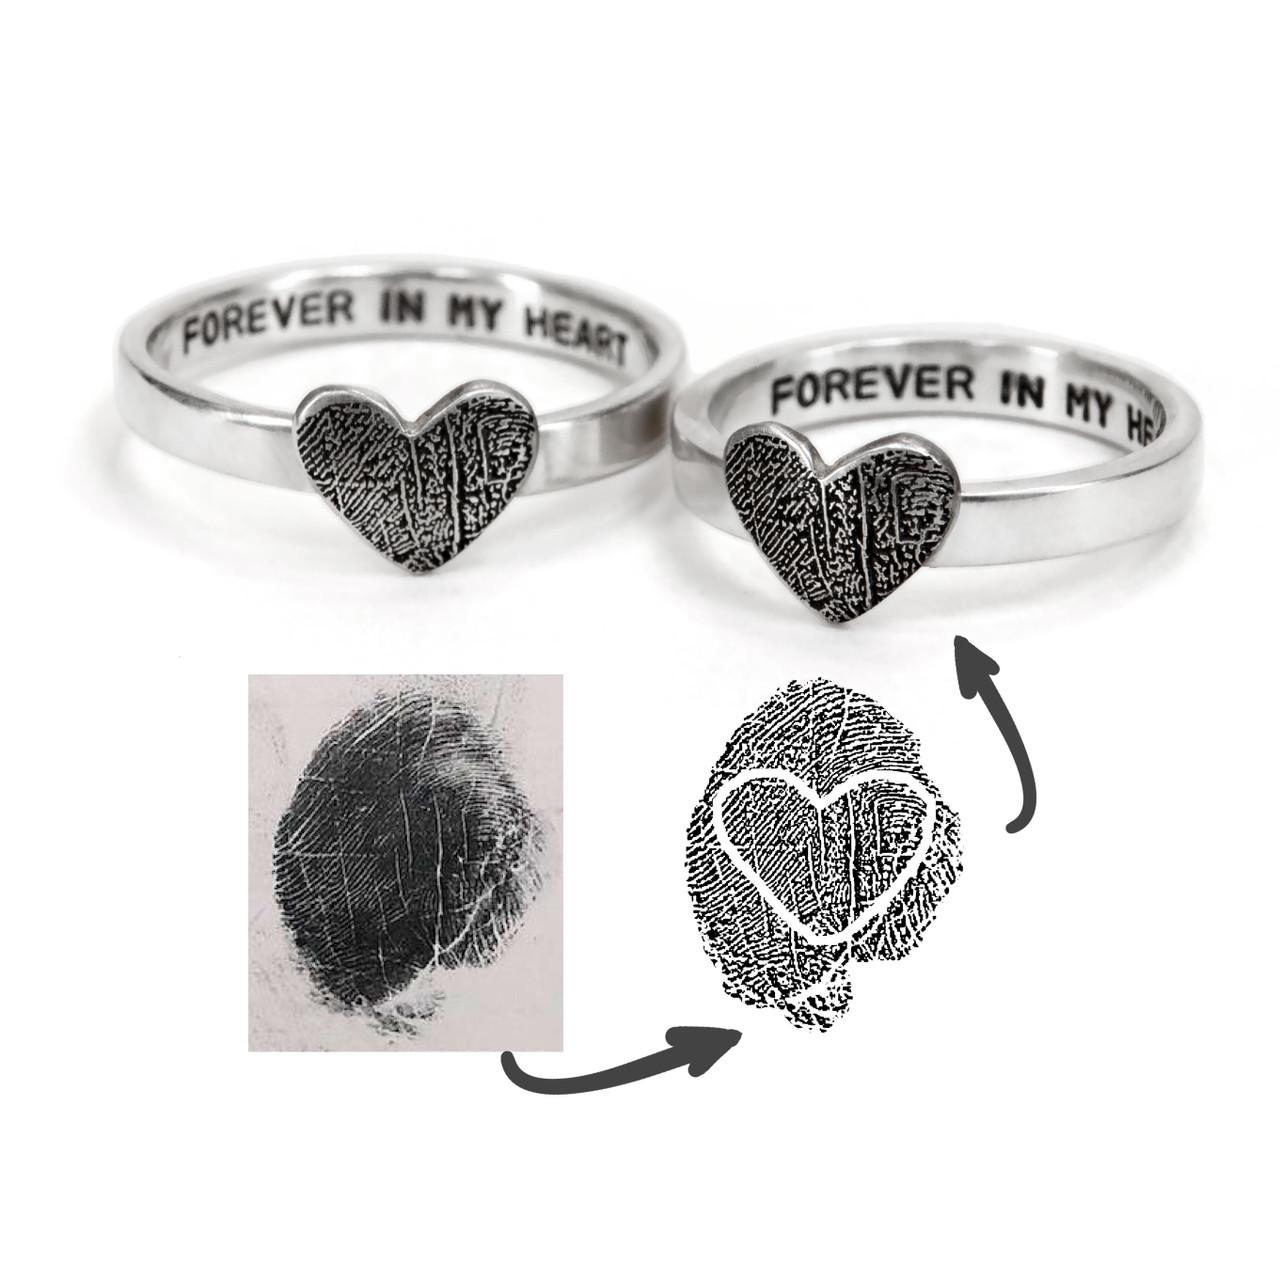 custom heart shaped fingerprint jewelry rings in sterling silver, shown on with original fingerprint